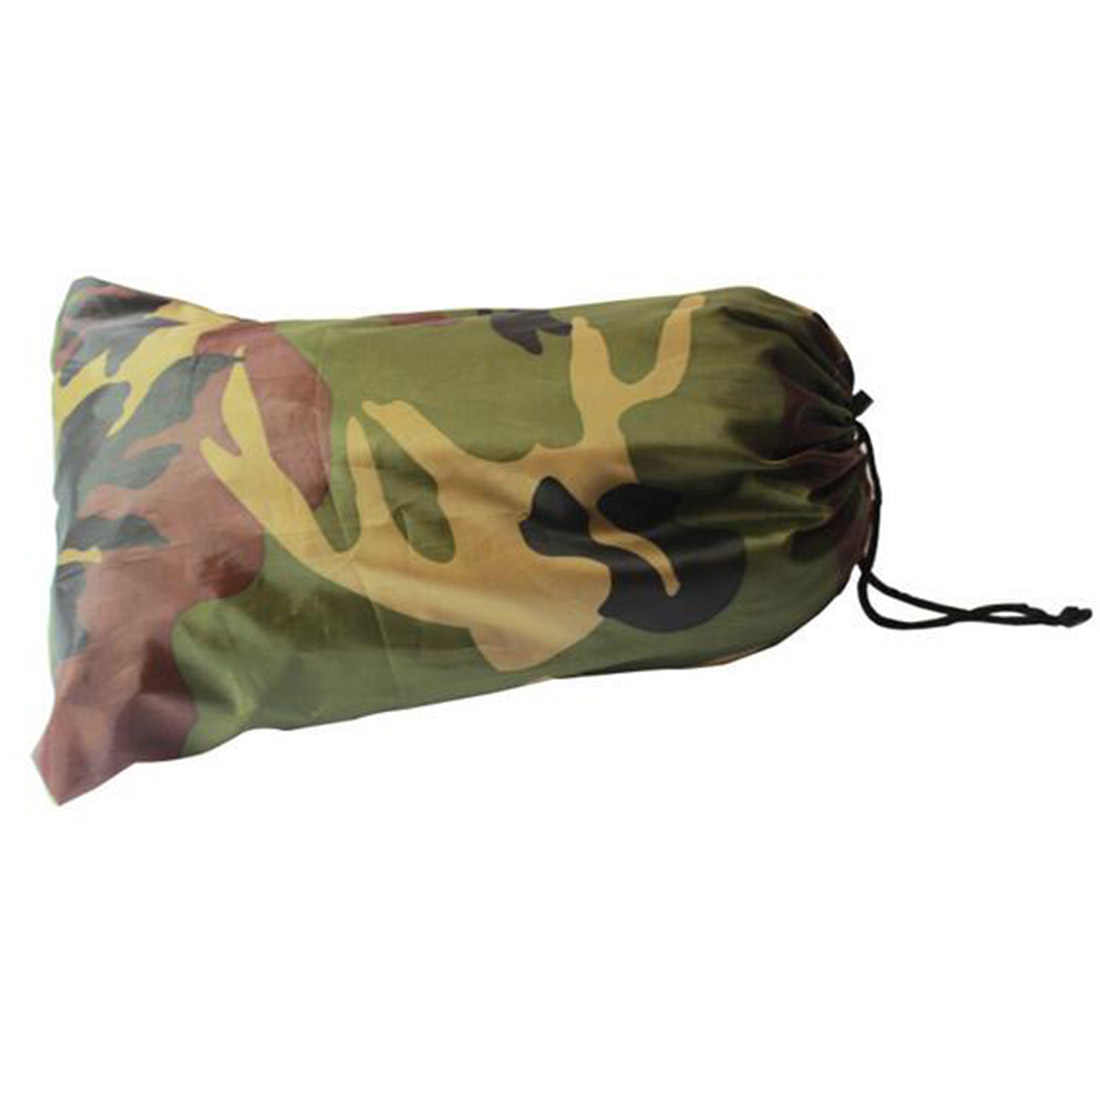 2x3m bois Camouflage Net Camo filet Camping plage militaire chasse grand abri ombre auvent tente